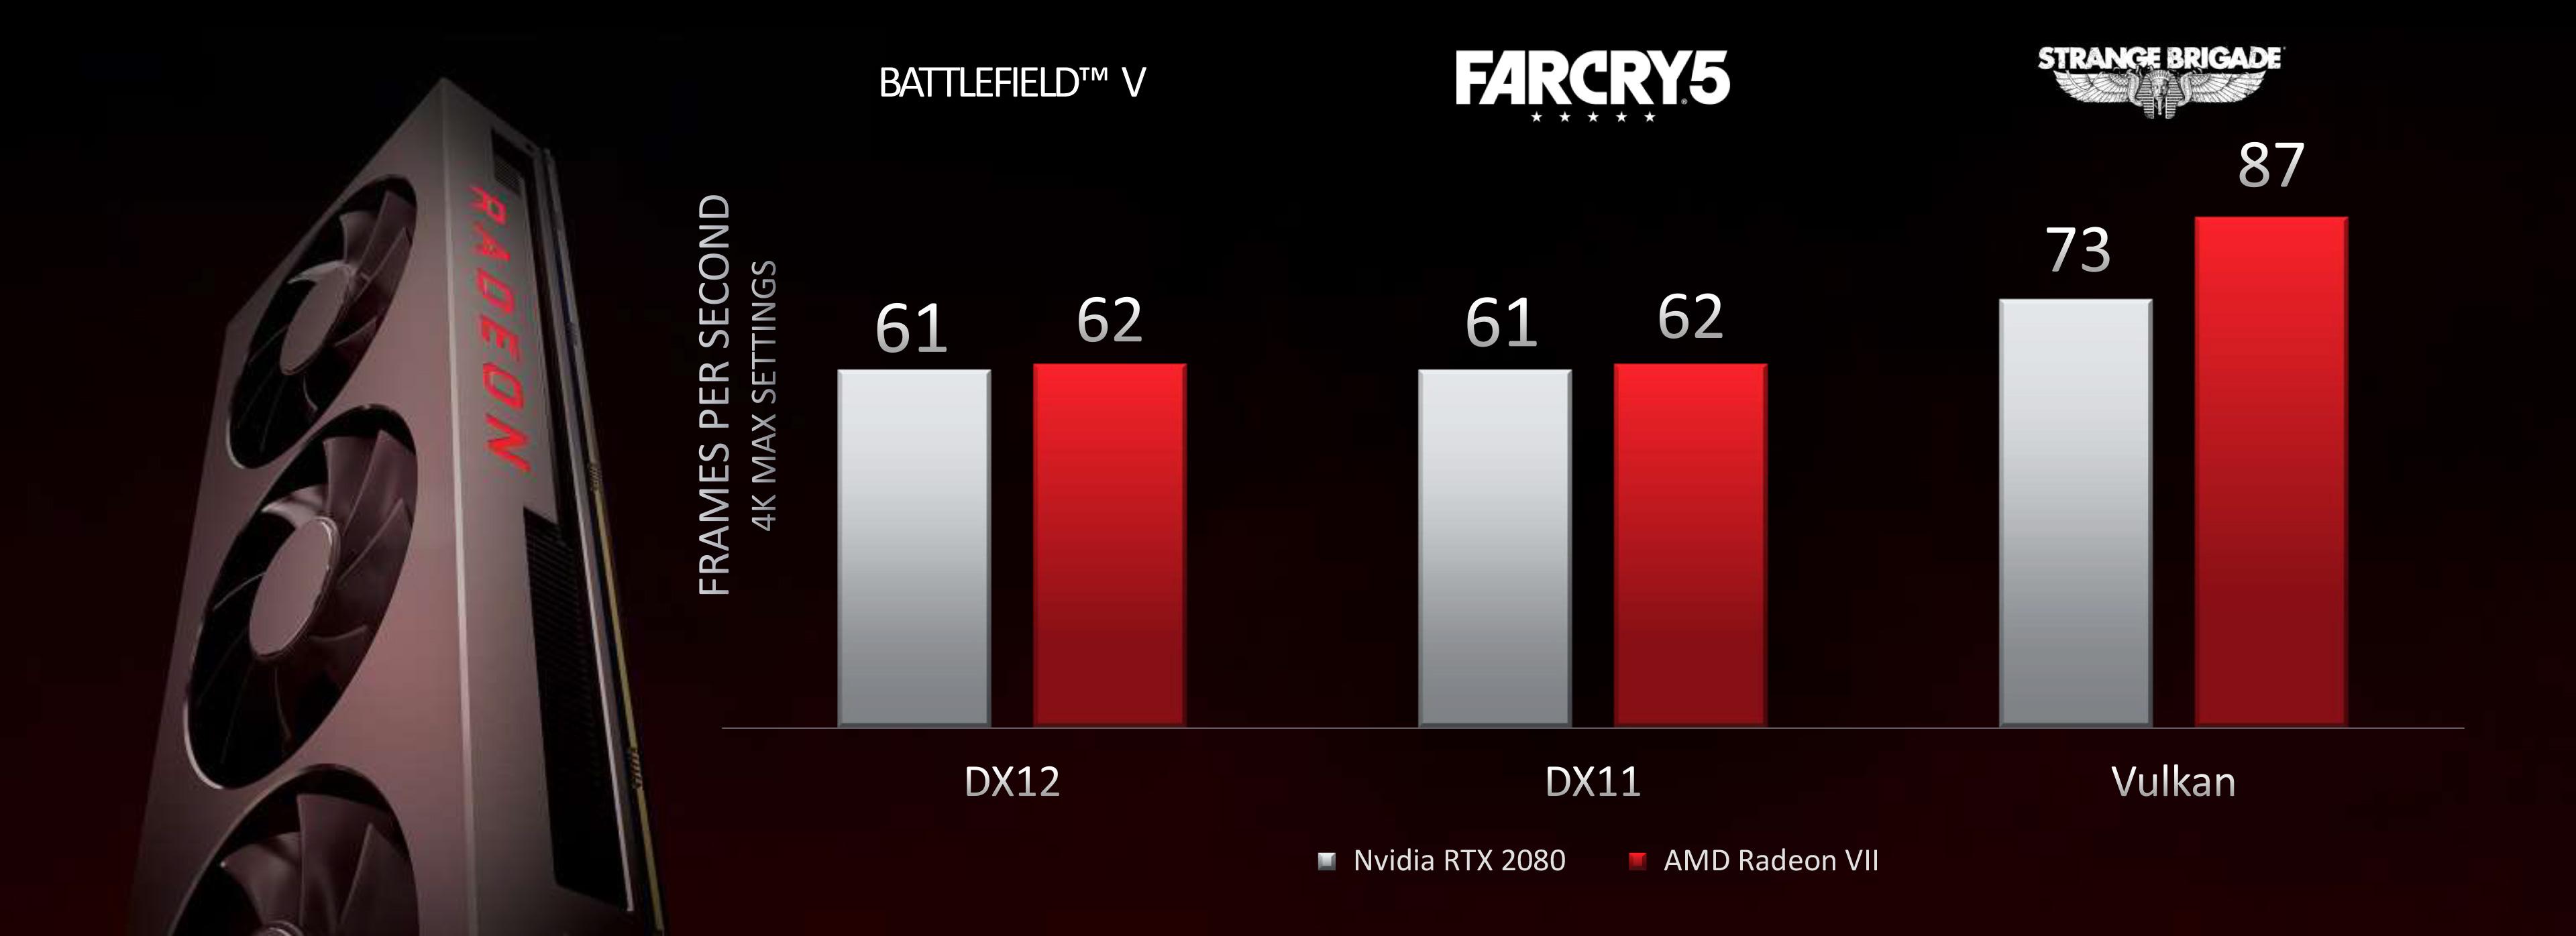 AMD Reveals Radeon VII: High-End 7nm Vega Video Card Arrives